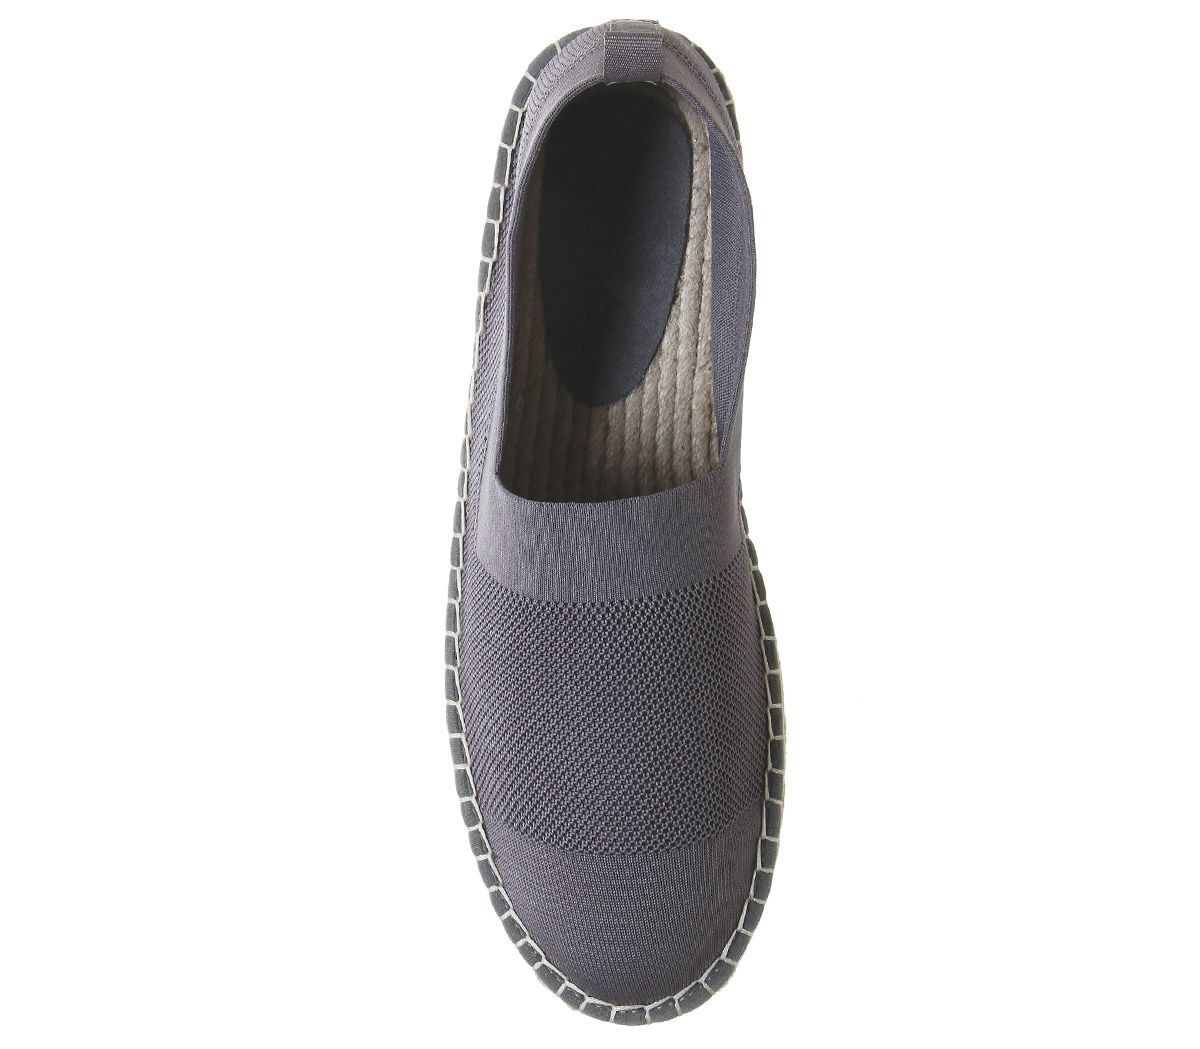 Mens-Office-Lombok-Knit-Espadrilles-Grey-Casual-Shoes thumbnail 5